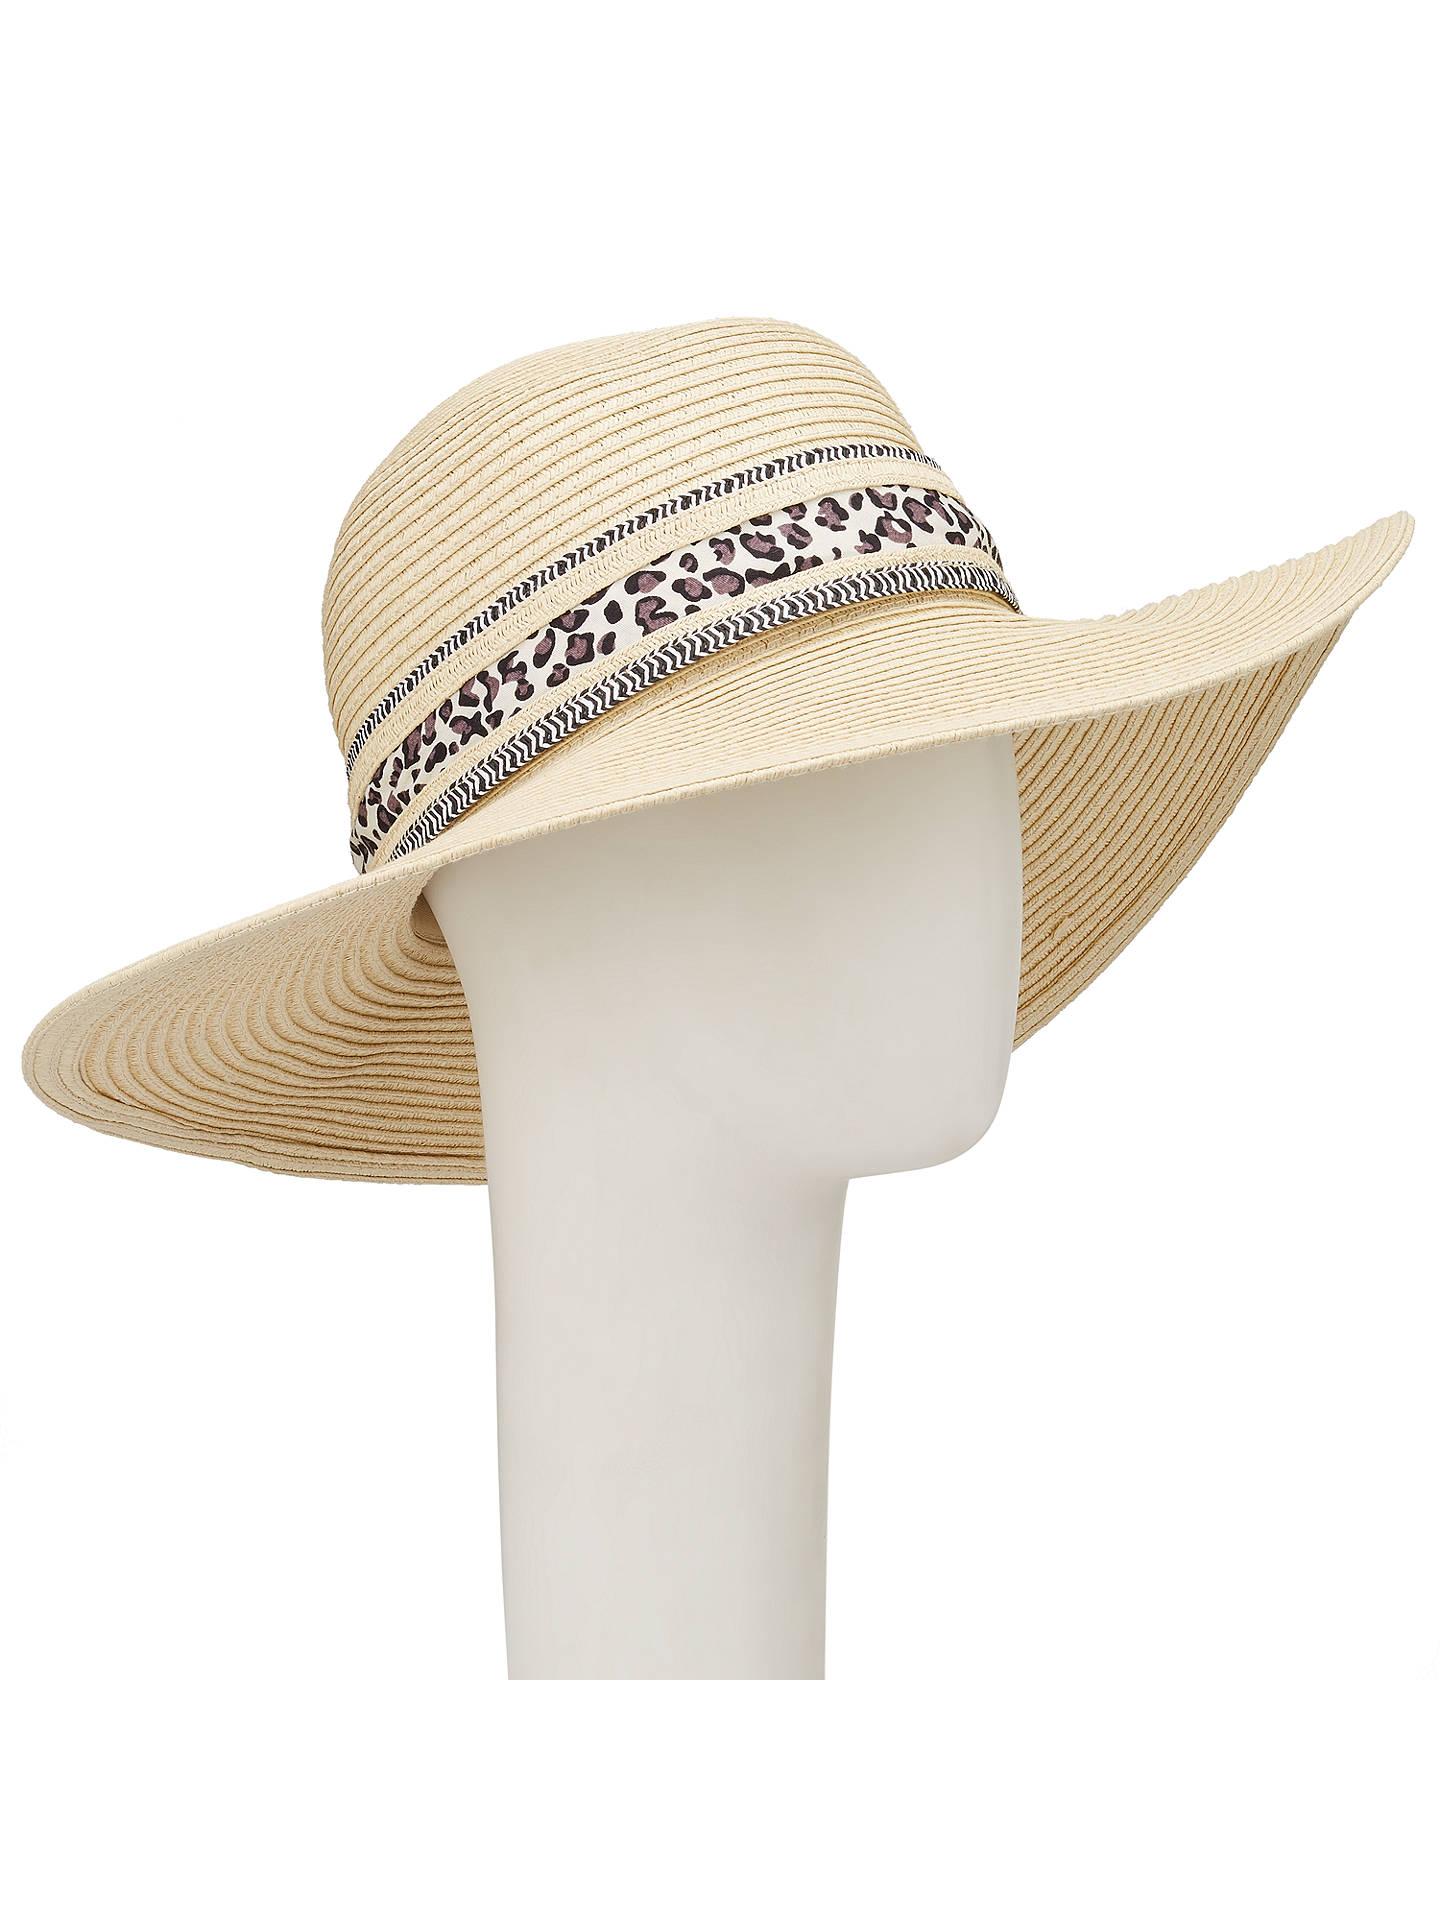 65b5a9d7 Buy John Lewis Packable Floppy Ribbon Trim Sun Hat, Natural Online at  johnlewis.com ...